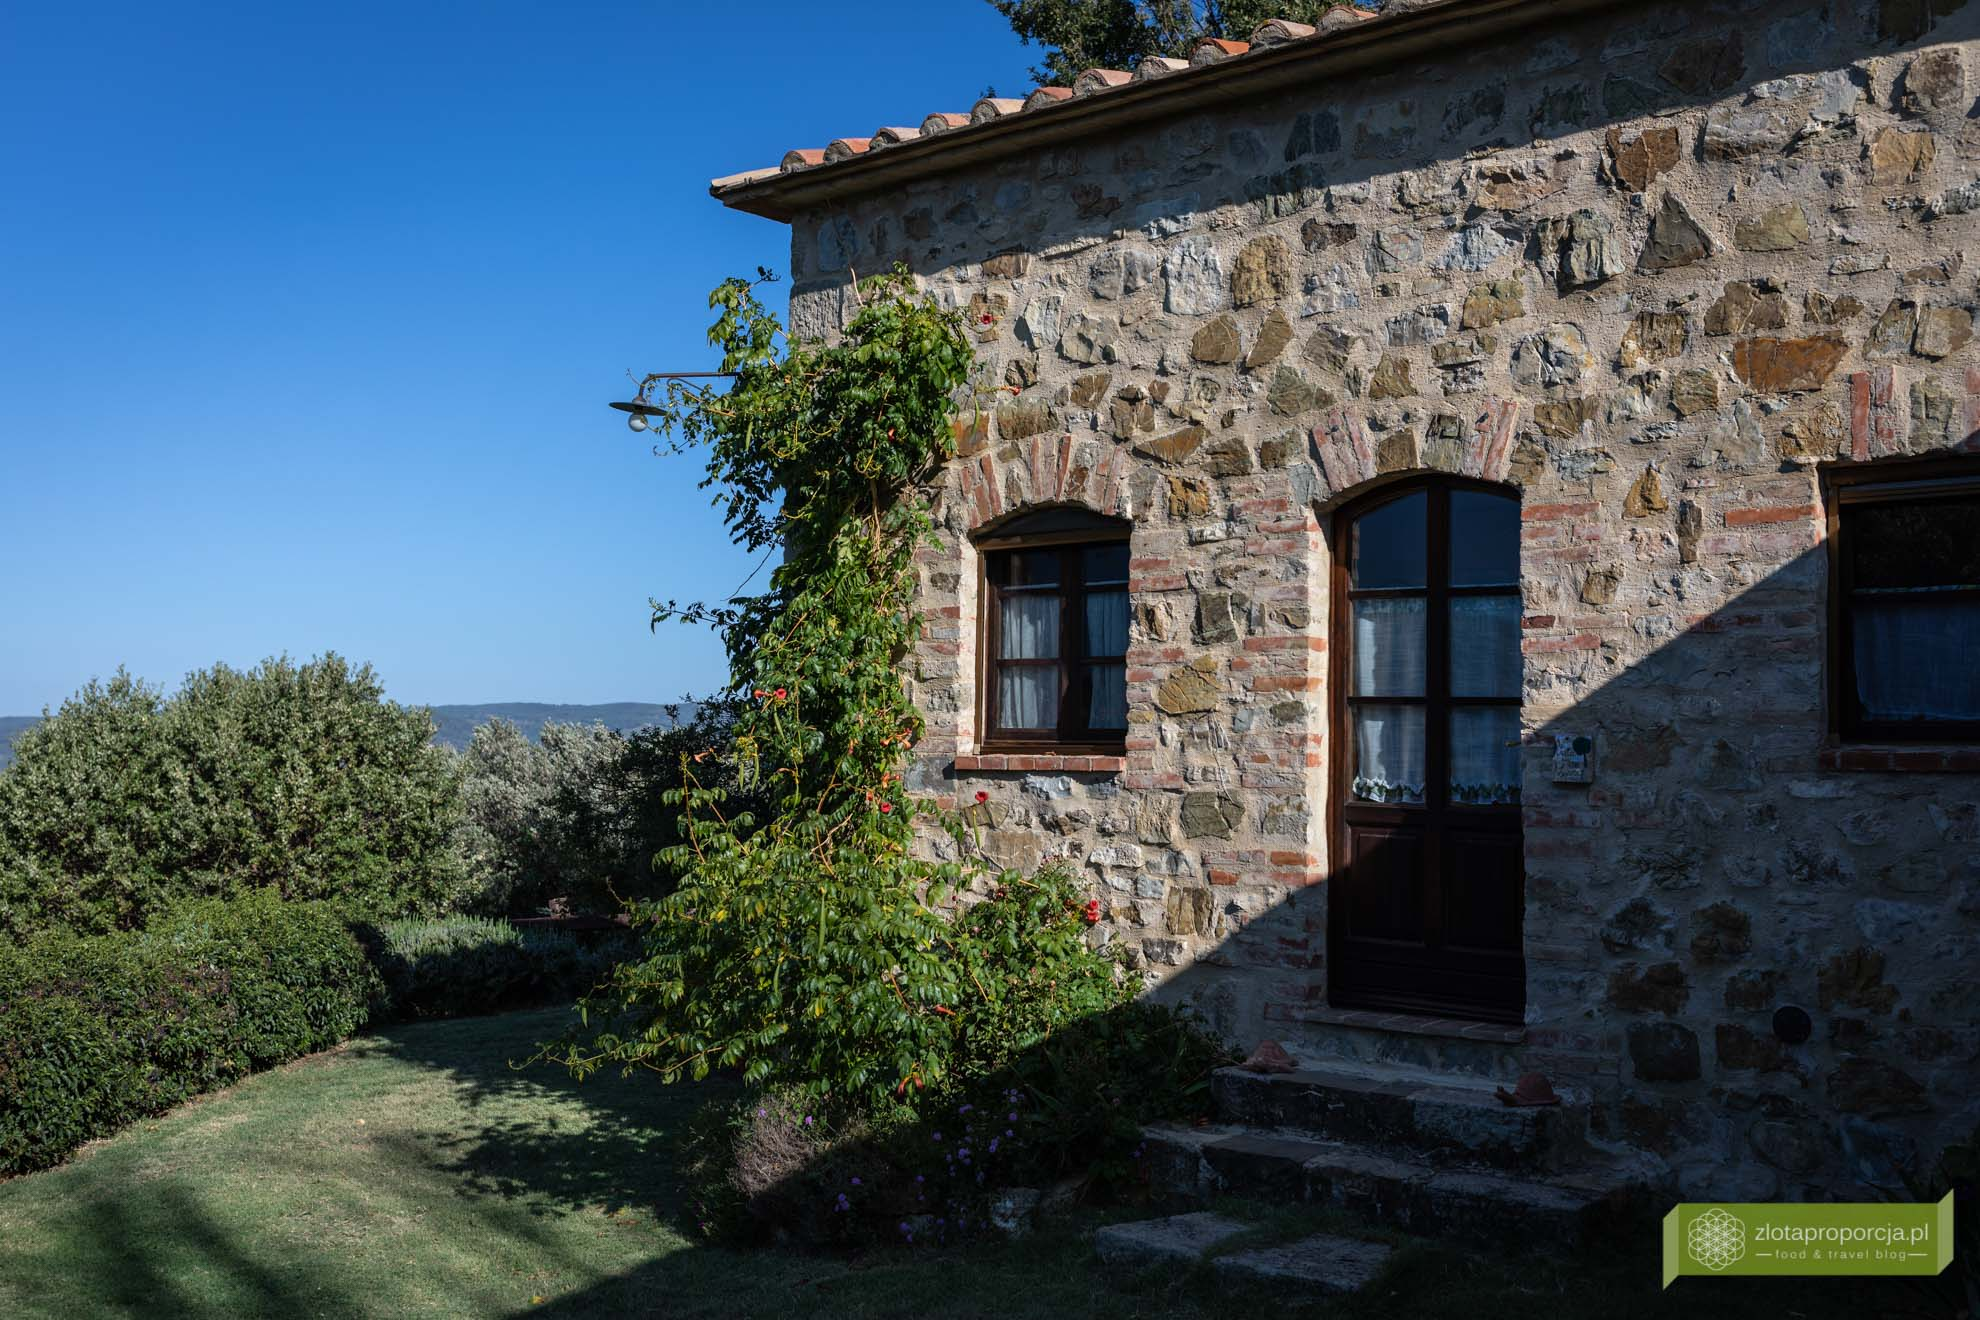 Agroturystka Val d'Orcia; Toskania; Val d'Orcia; Agroturystyka Toskania;